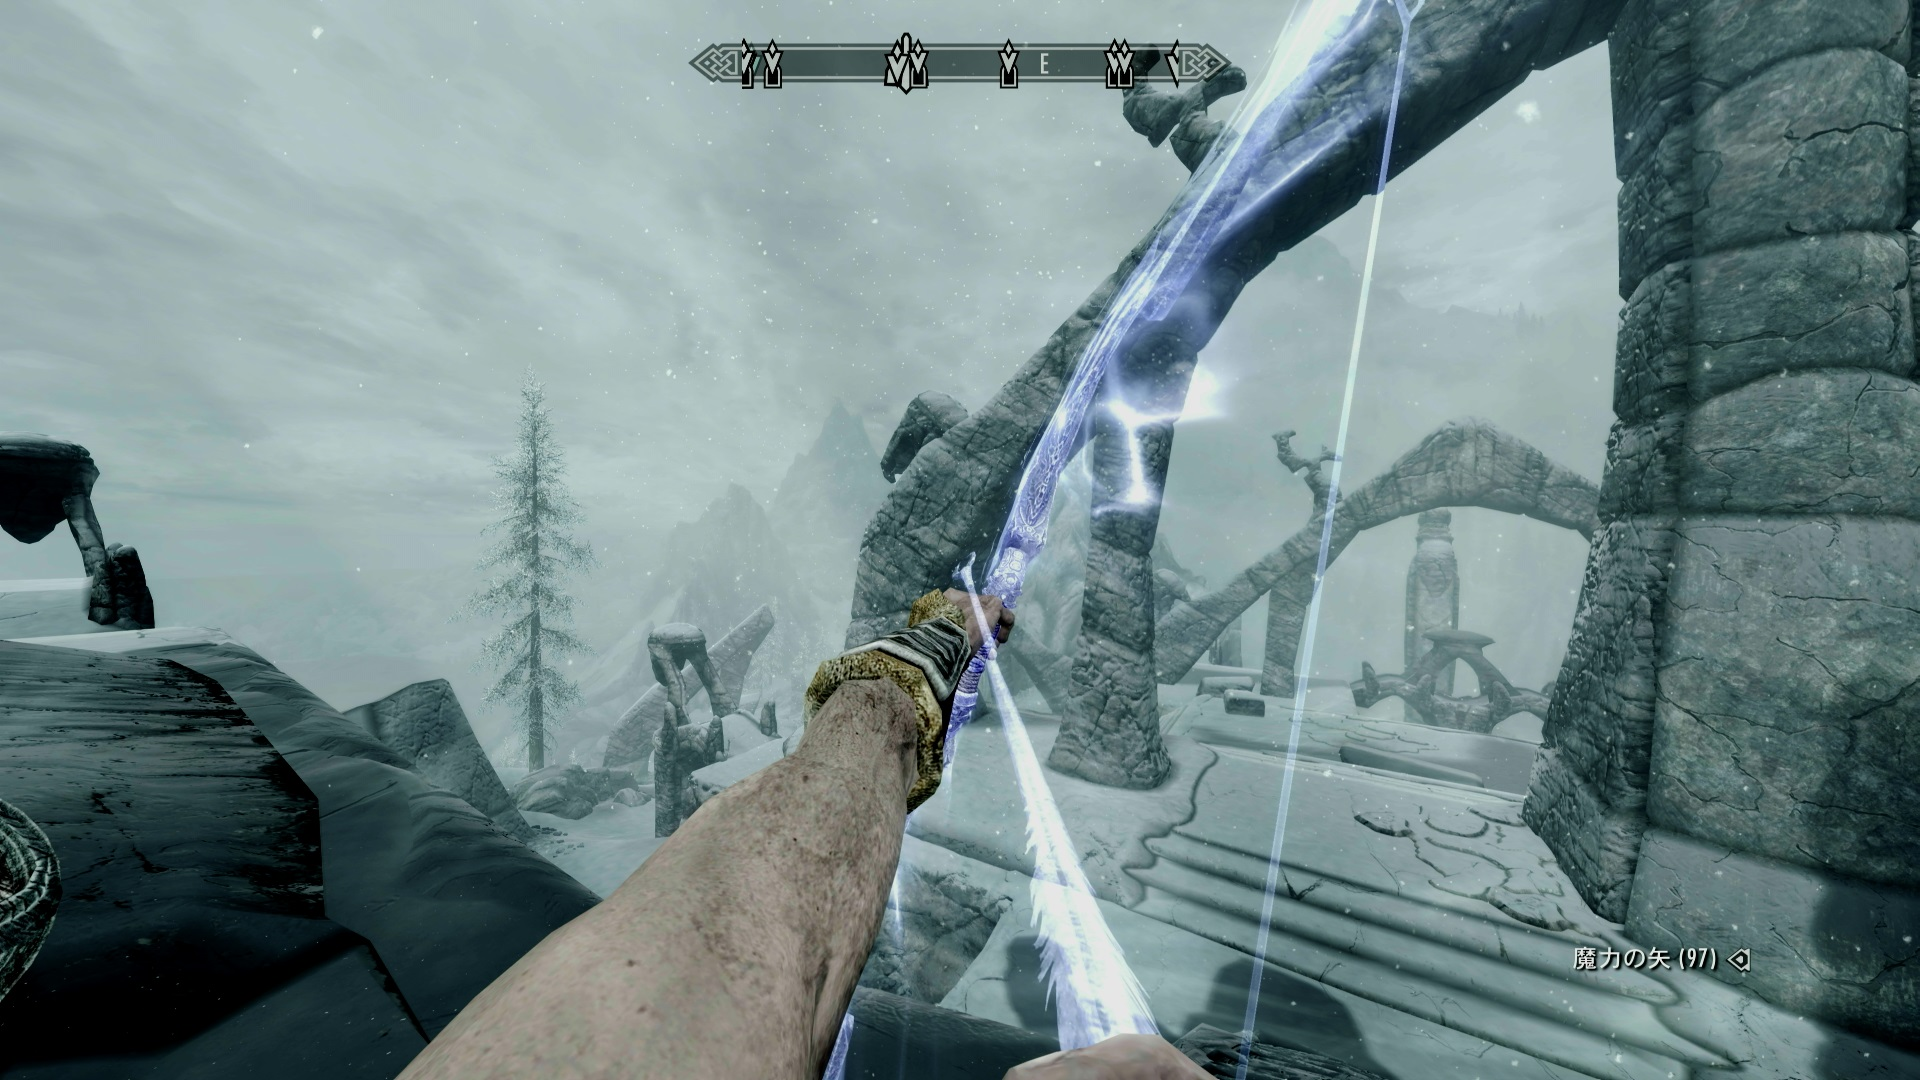 Ps4 mod スカイリム 神 【決定版】PS4版SKYRIMでおすすめなMODを動画付きで紹介